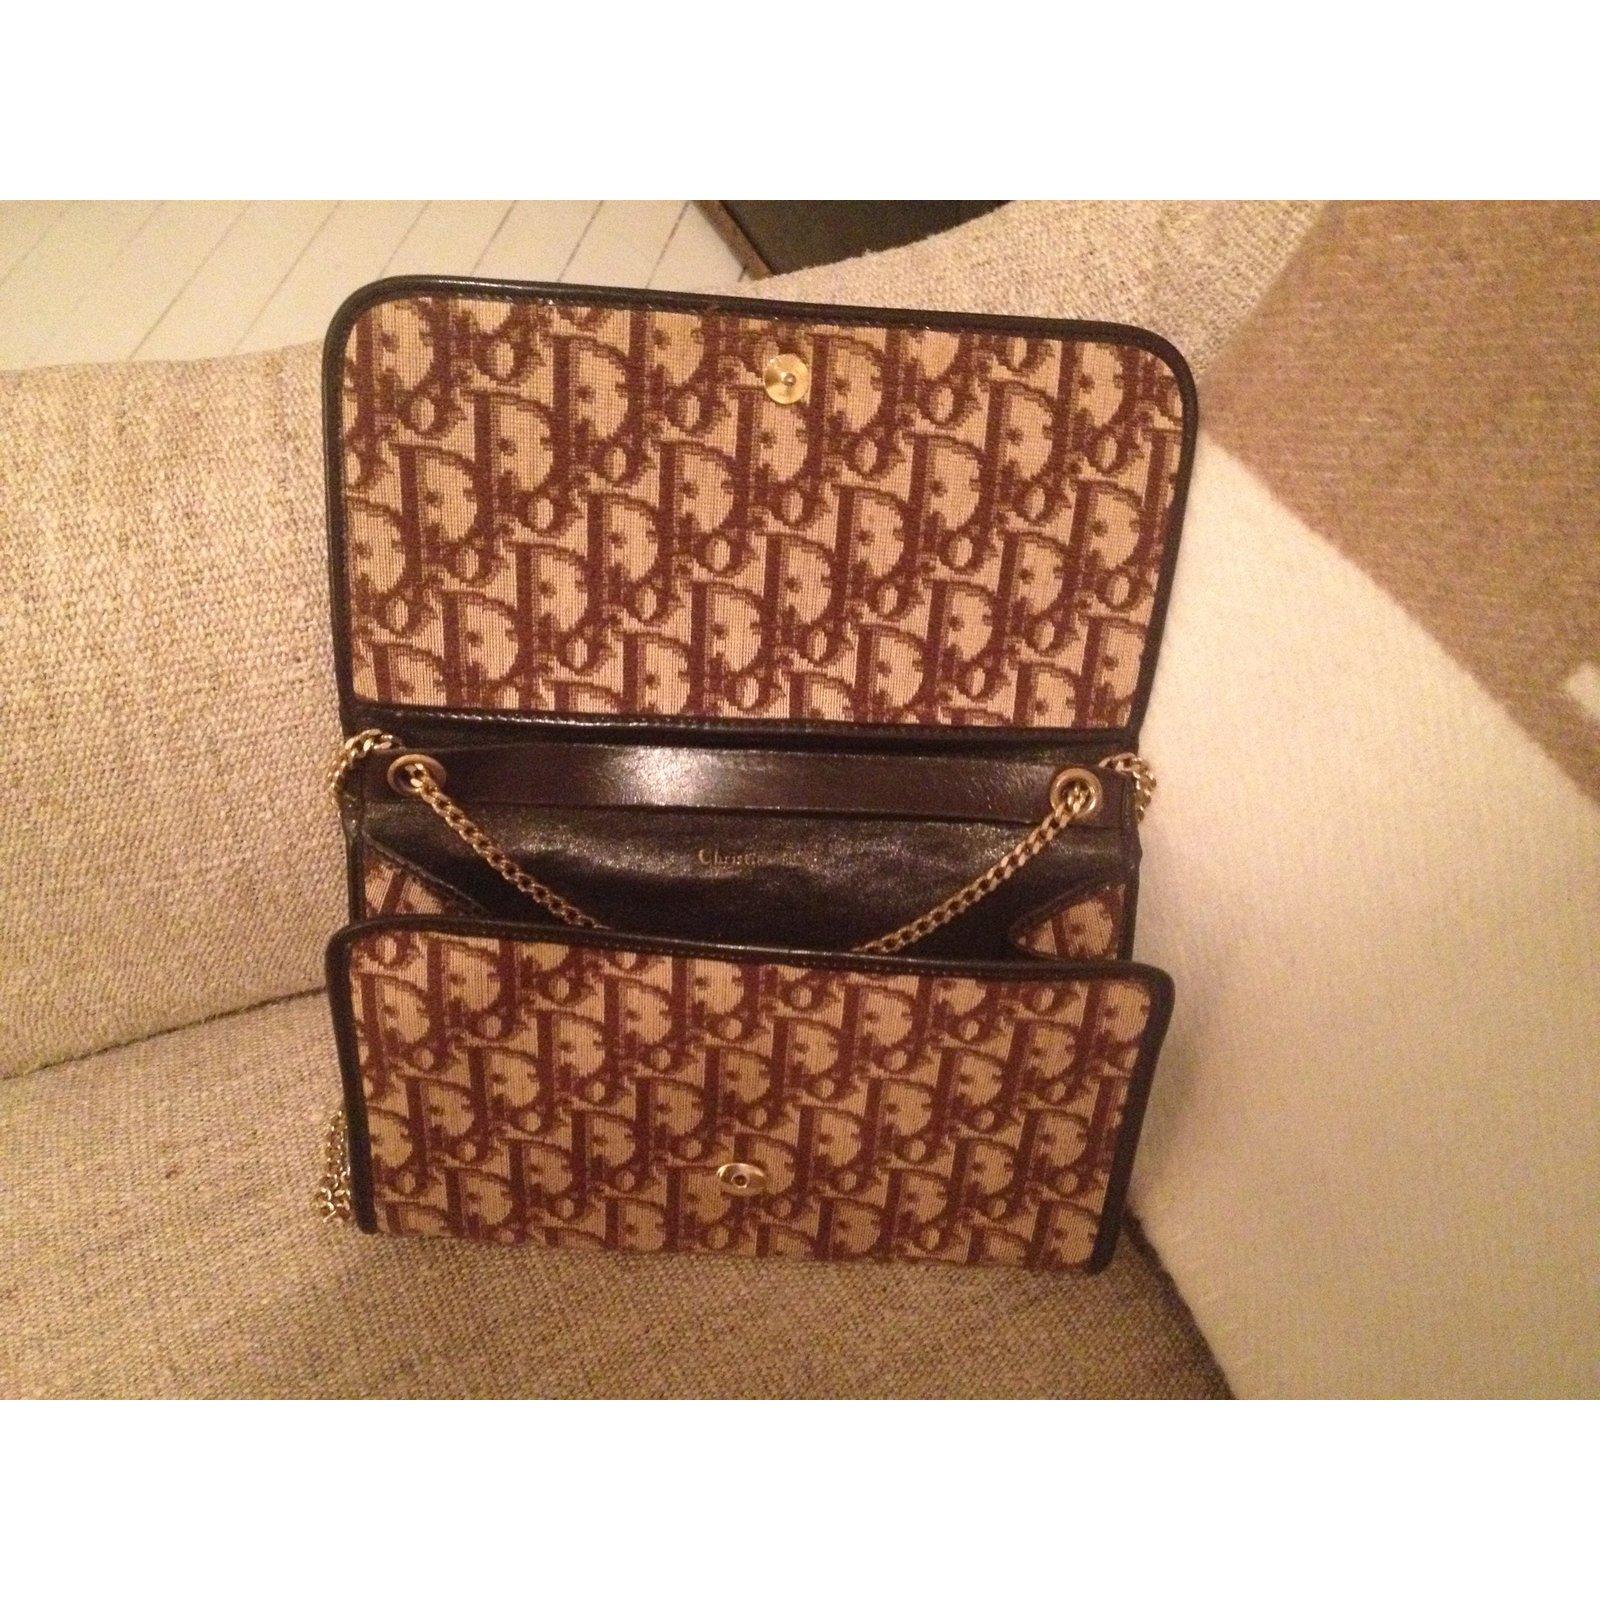 c930c4464b33c9 Sacs à main Dior Petit sac pochette Vintage Dior Cuir,Toile Marron,Beige  ref.28751 - Joli Closet